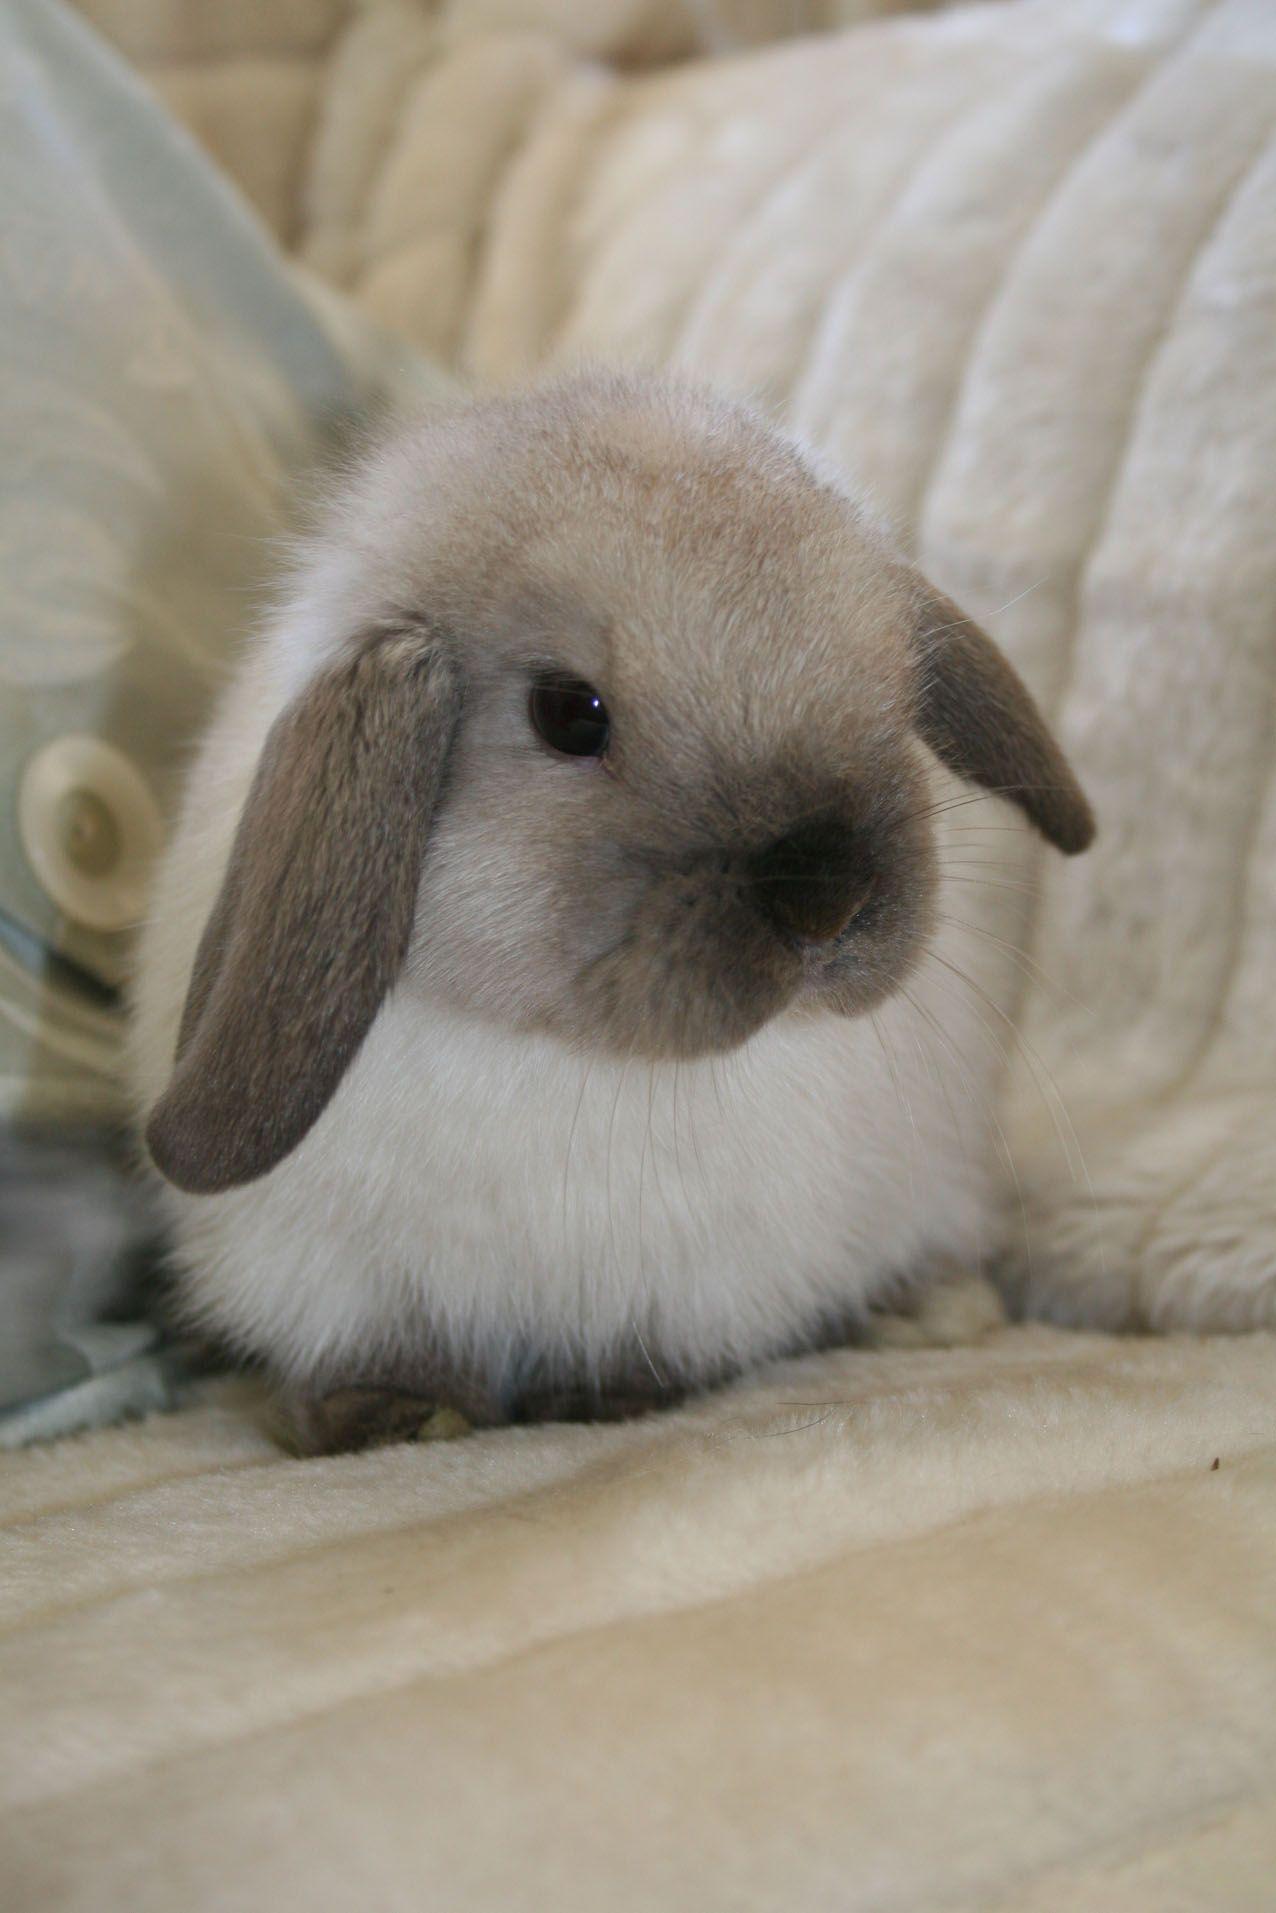 Mini Lop Mini Lop Bucks Elstead Rabbit Stud Tasmania 画像あり かわいいウサギ 子ウサギ 可愛い 動物